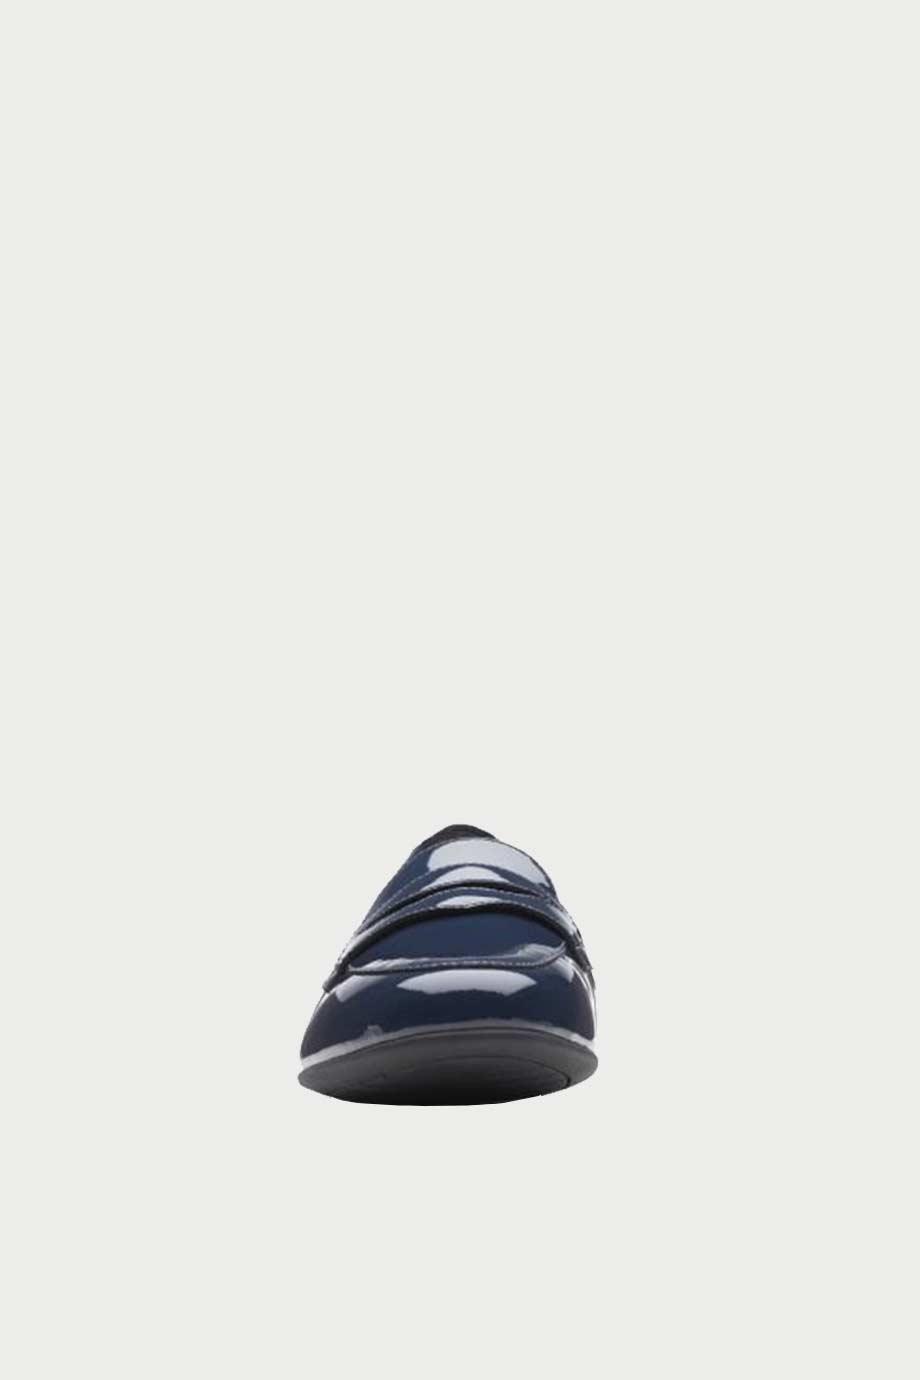 spiridoula metheniti shoes xalkida p un blush go clarks navy patent 3 1